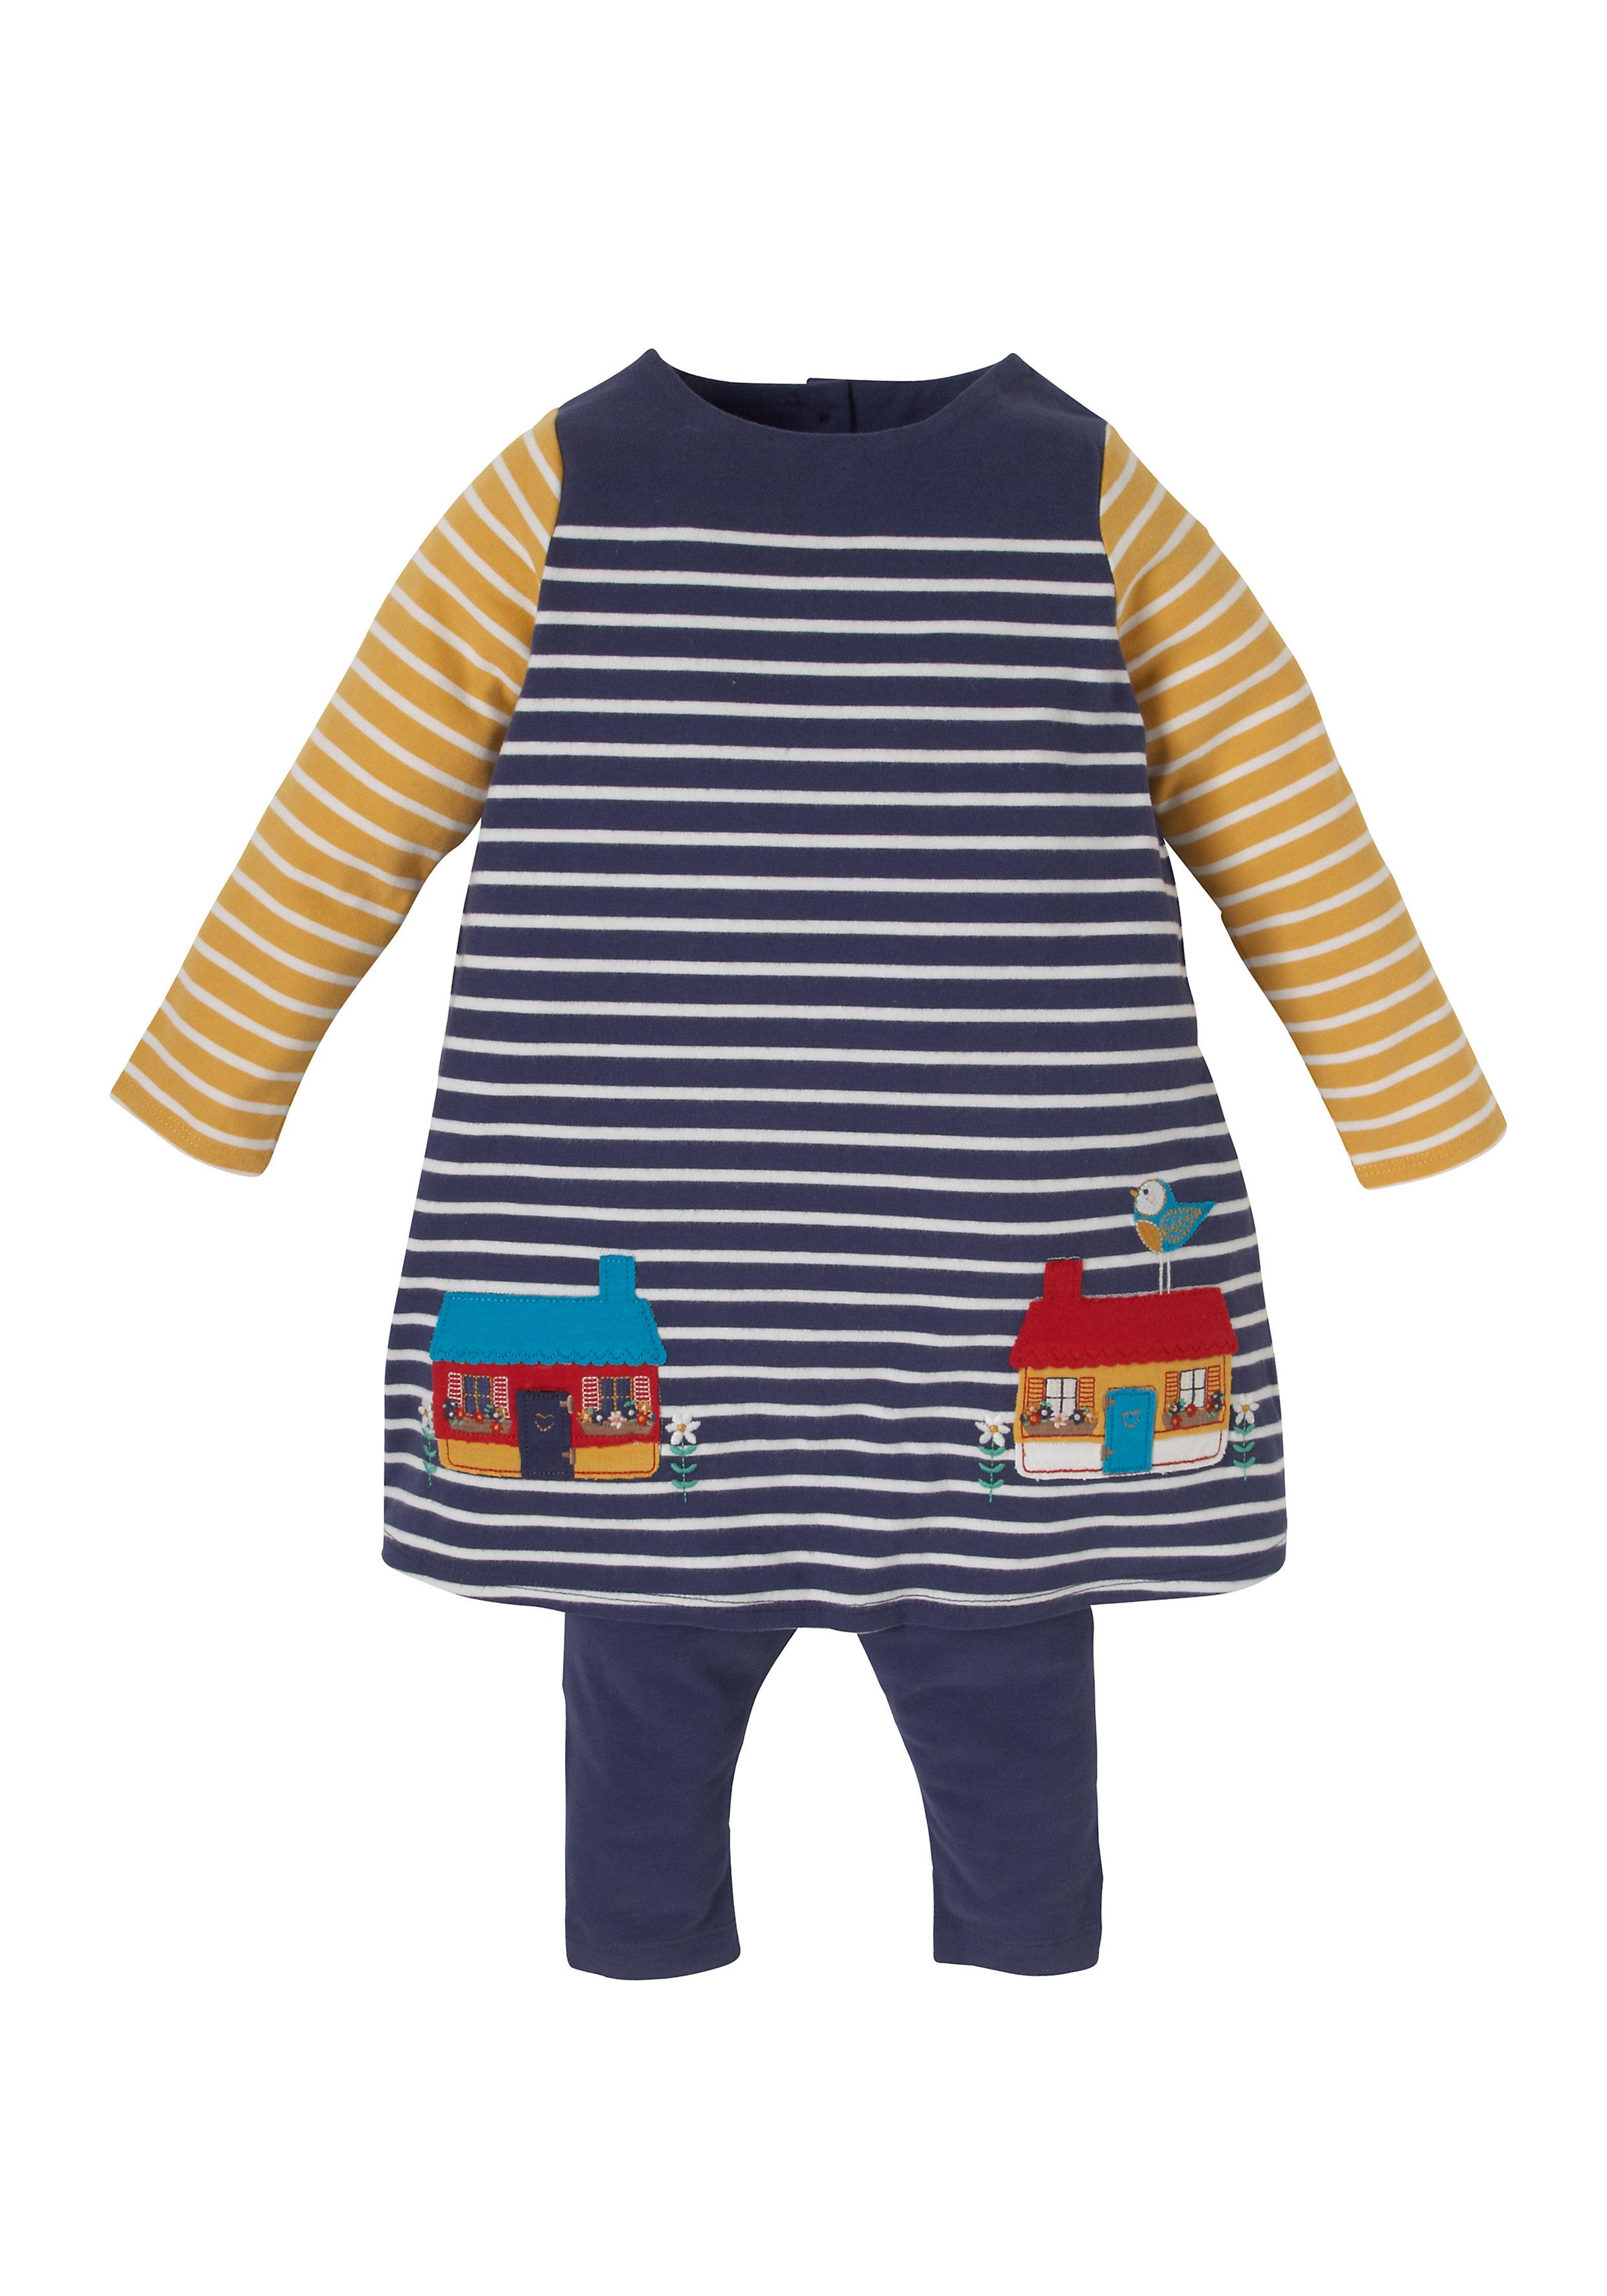 Mothercare | Girls Multi Striped Dress And Leggings - Navy